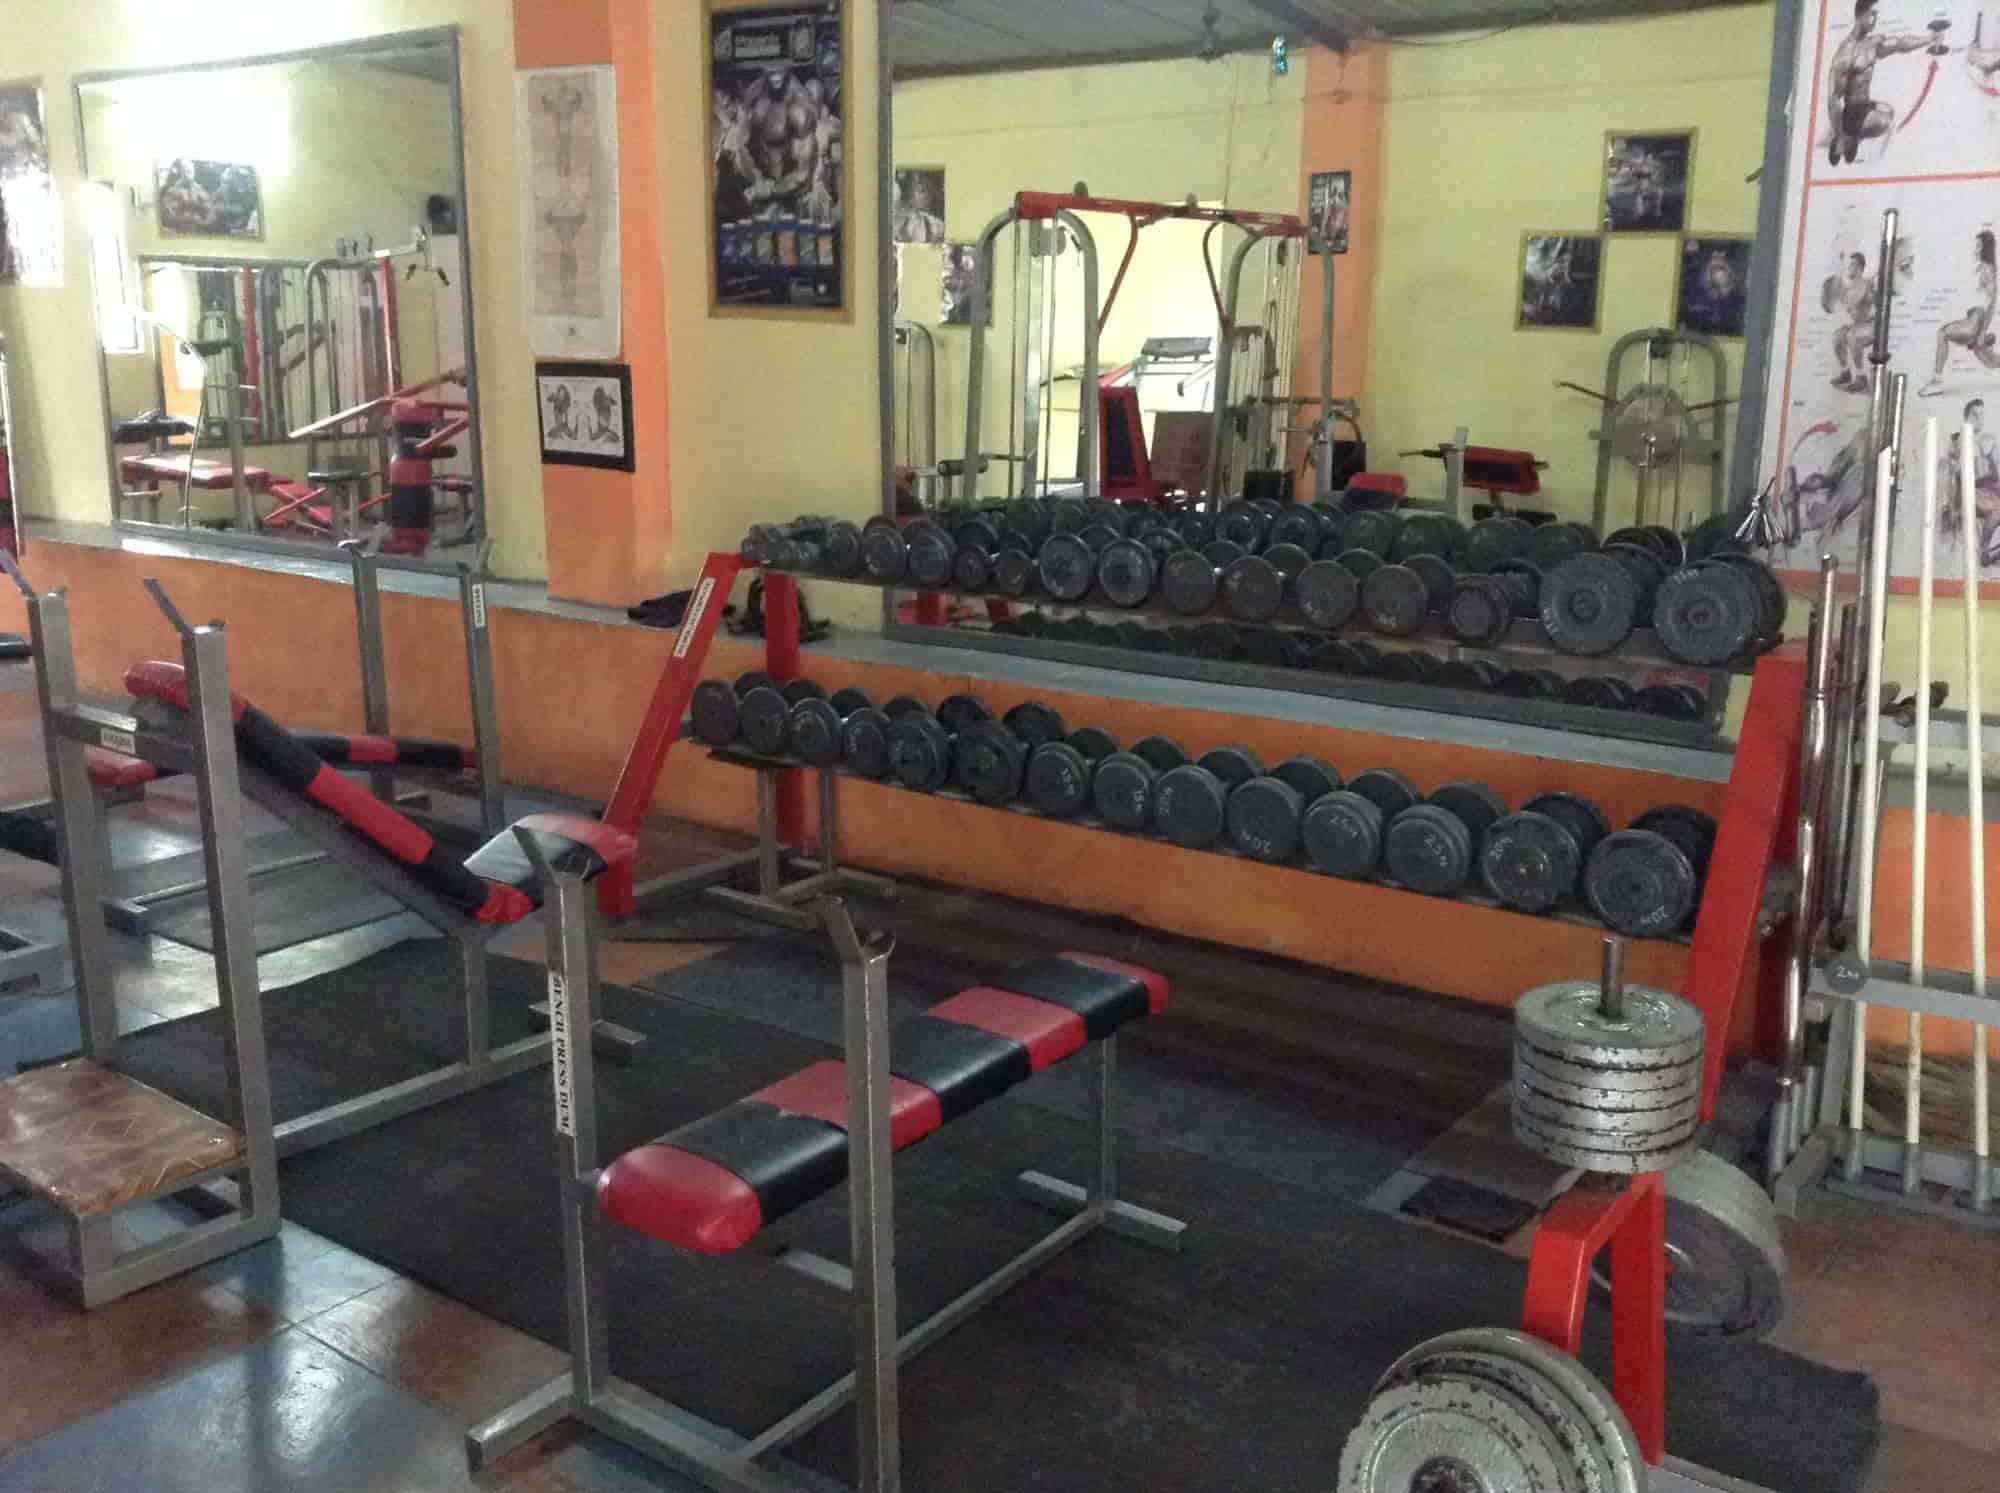 Bega gym